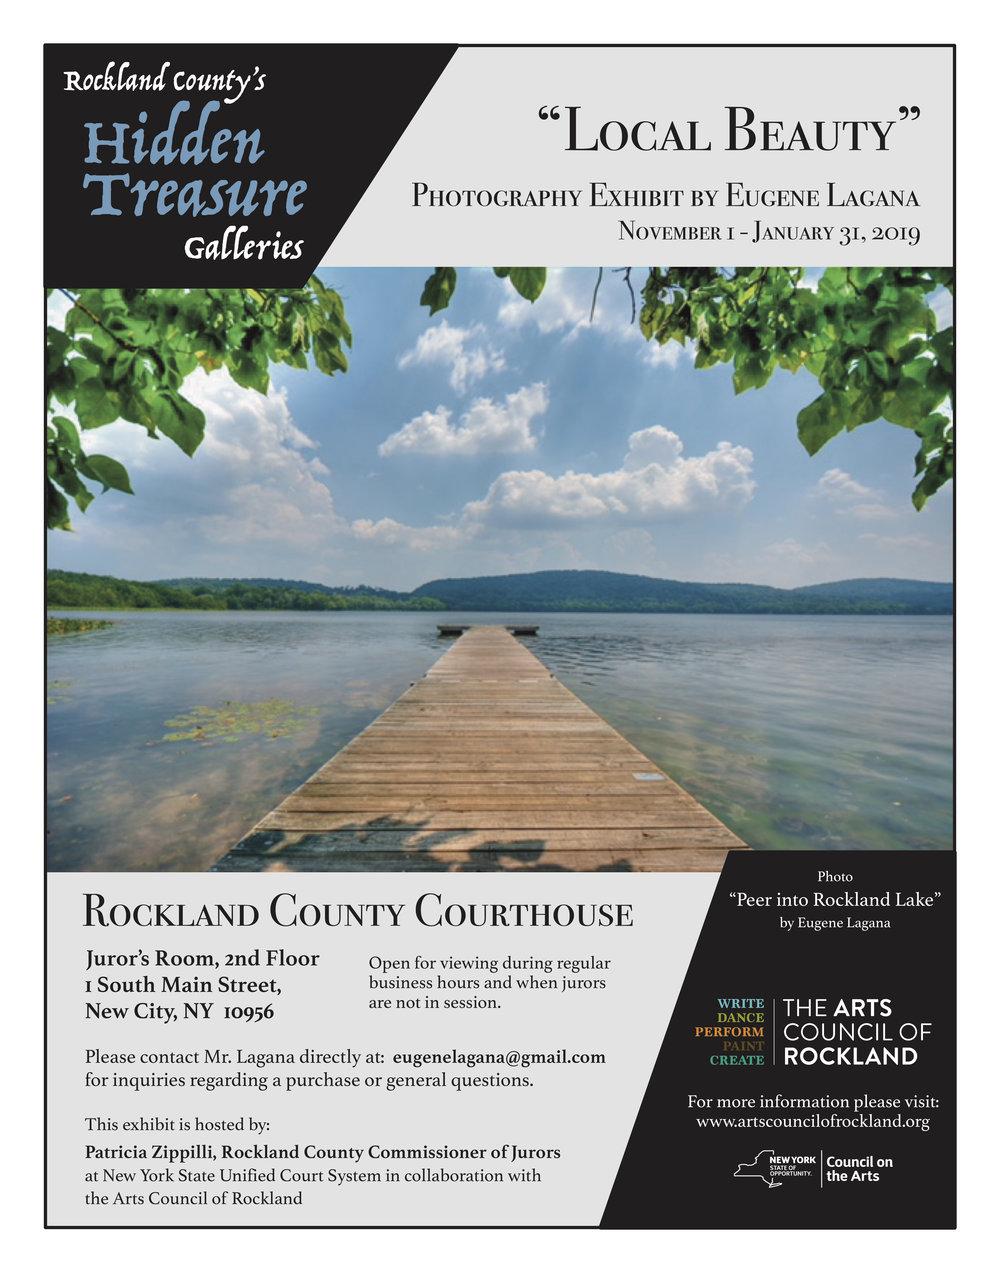 ACOR_Rockland-Courthouse-Show_Flyer-Final_Eugene-Lagana_11x14.jpg